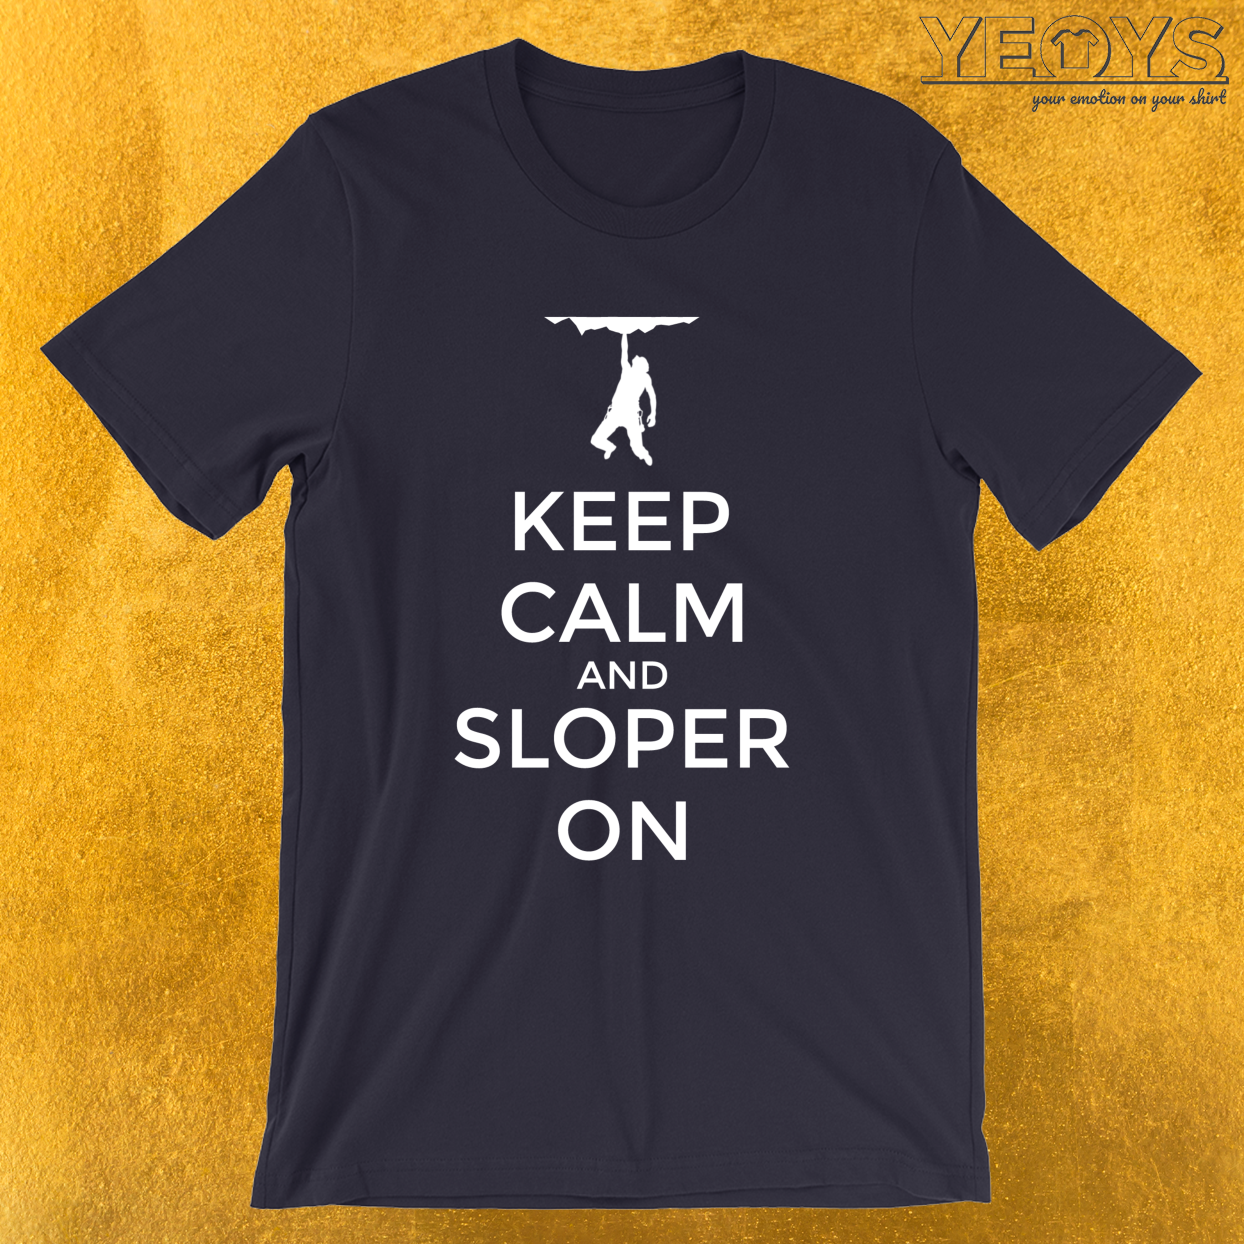 Keep Calm And Sloper On – Rock Climbing Tee